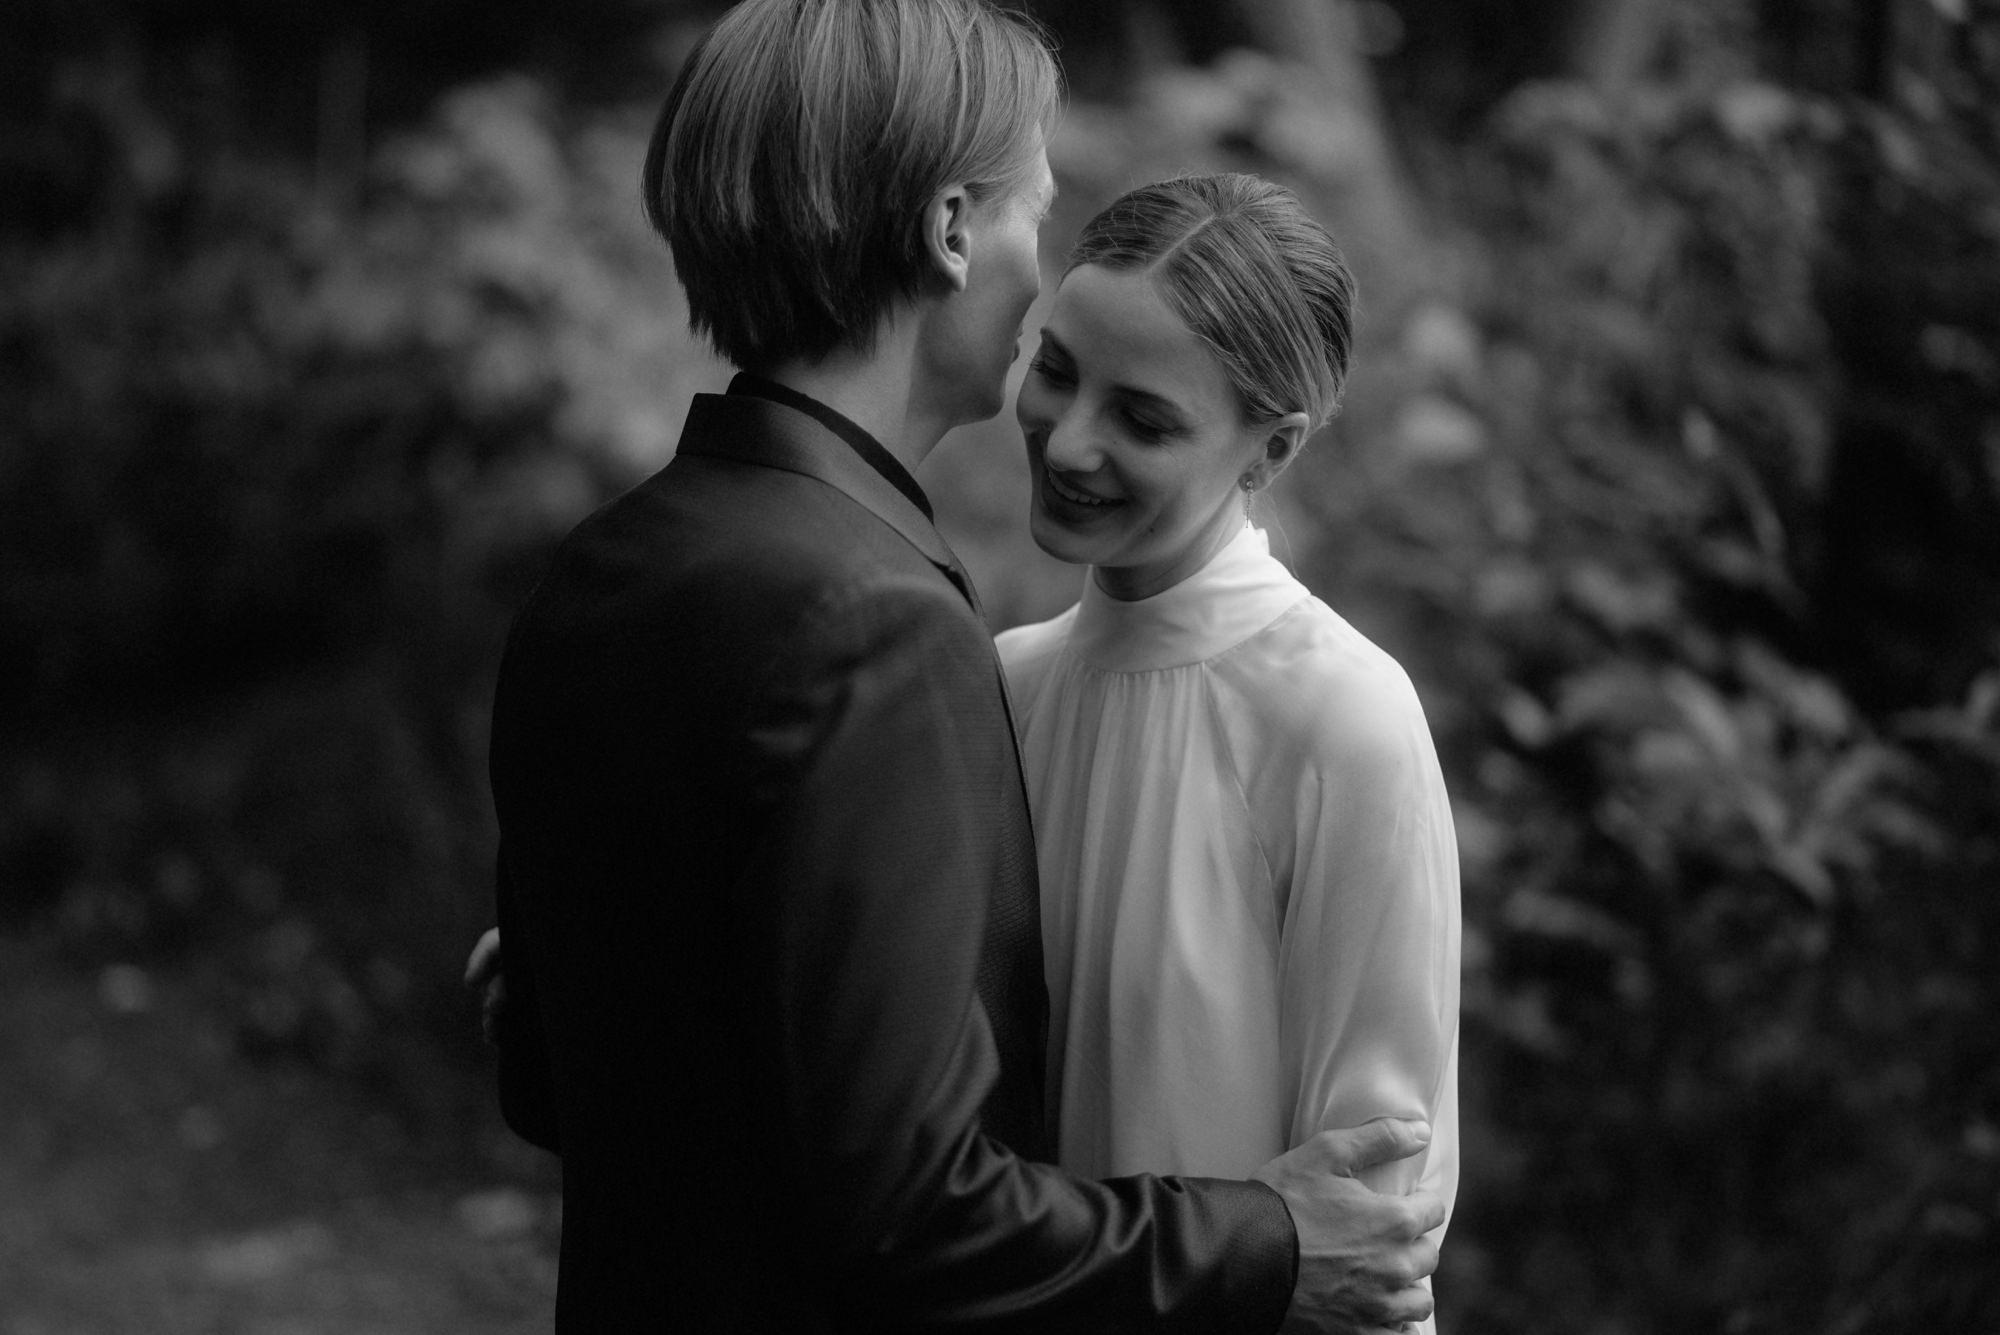 copenhagen wedding photography 0028 1